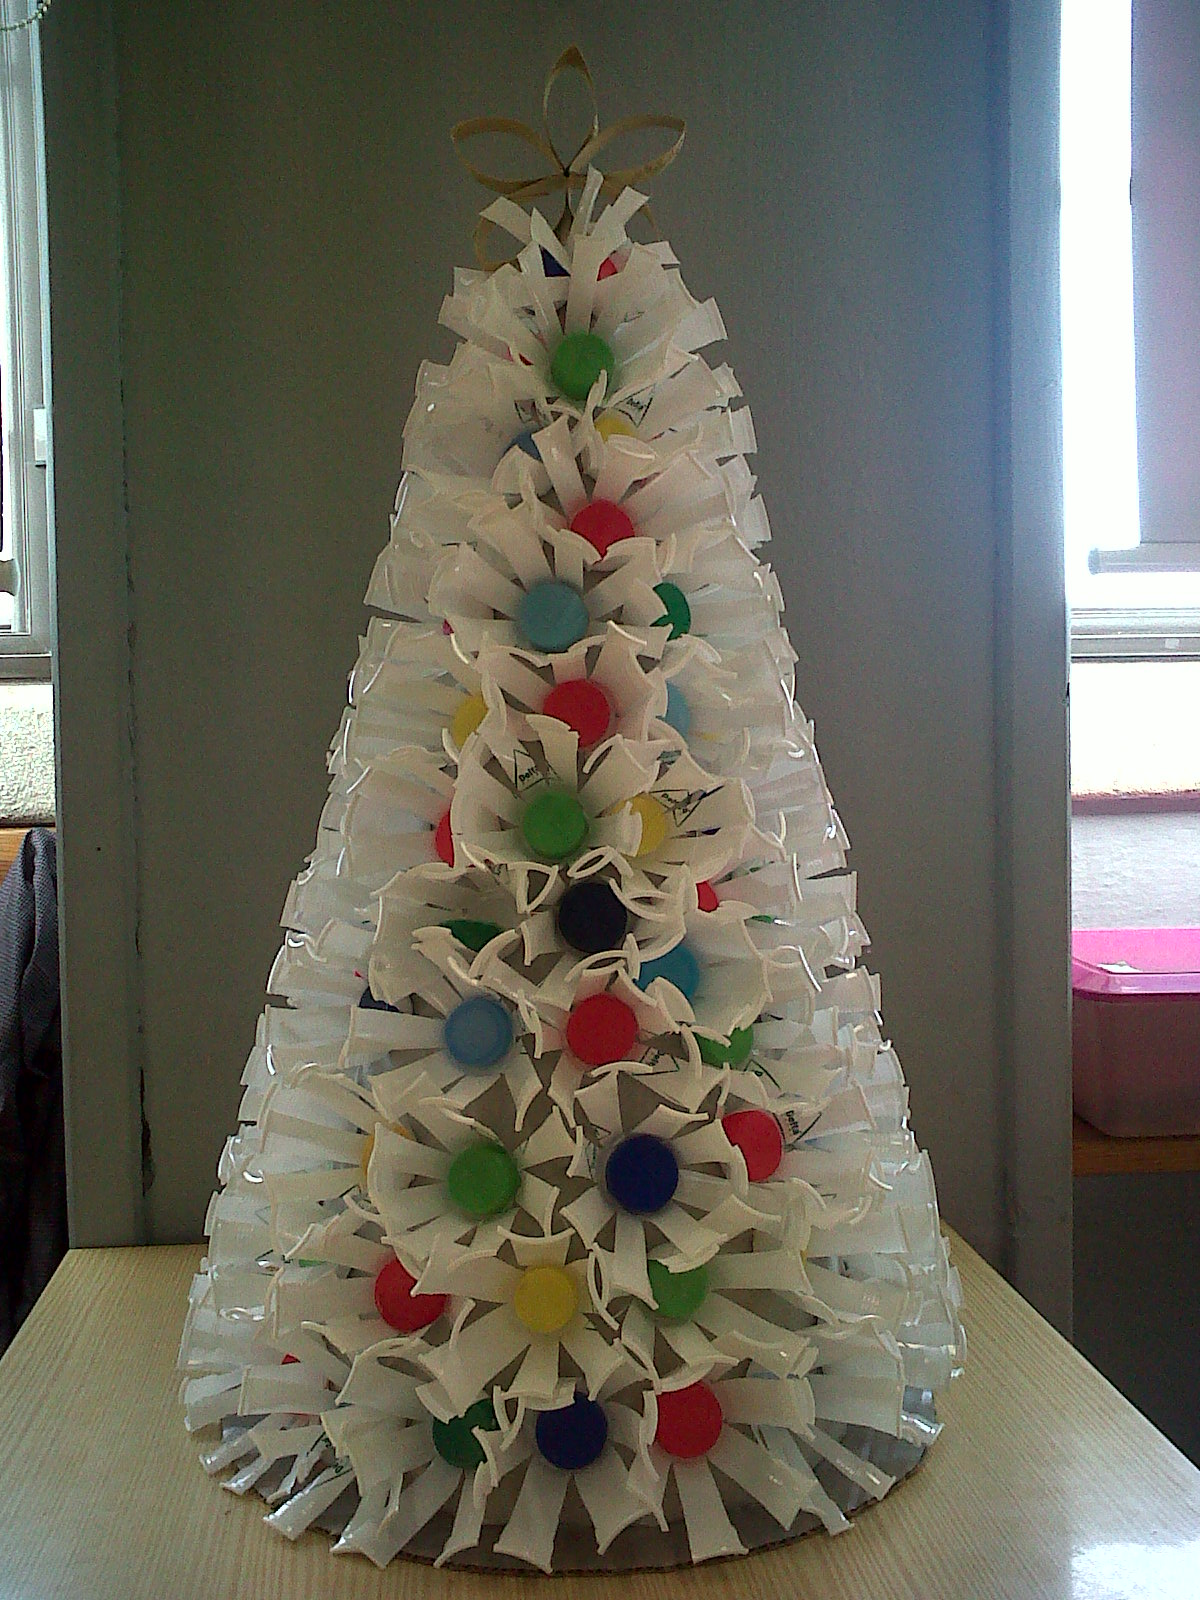 Biblioteca escolar e b 1 n 4 loul concurso natal reciclado for Bolas de navidad recicladas